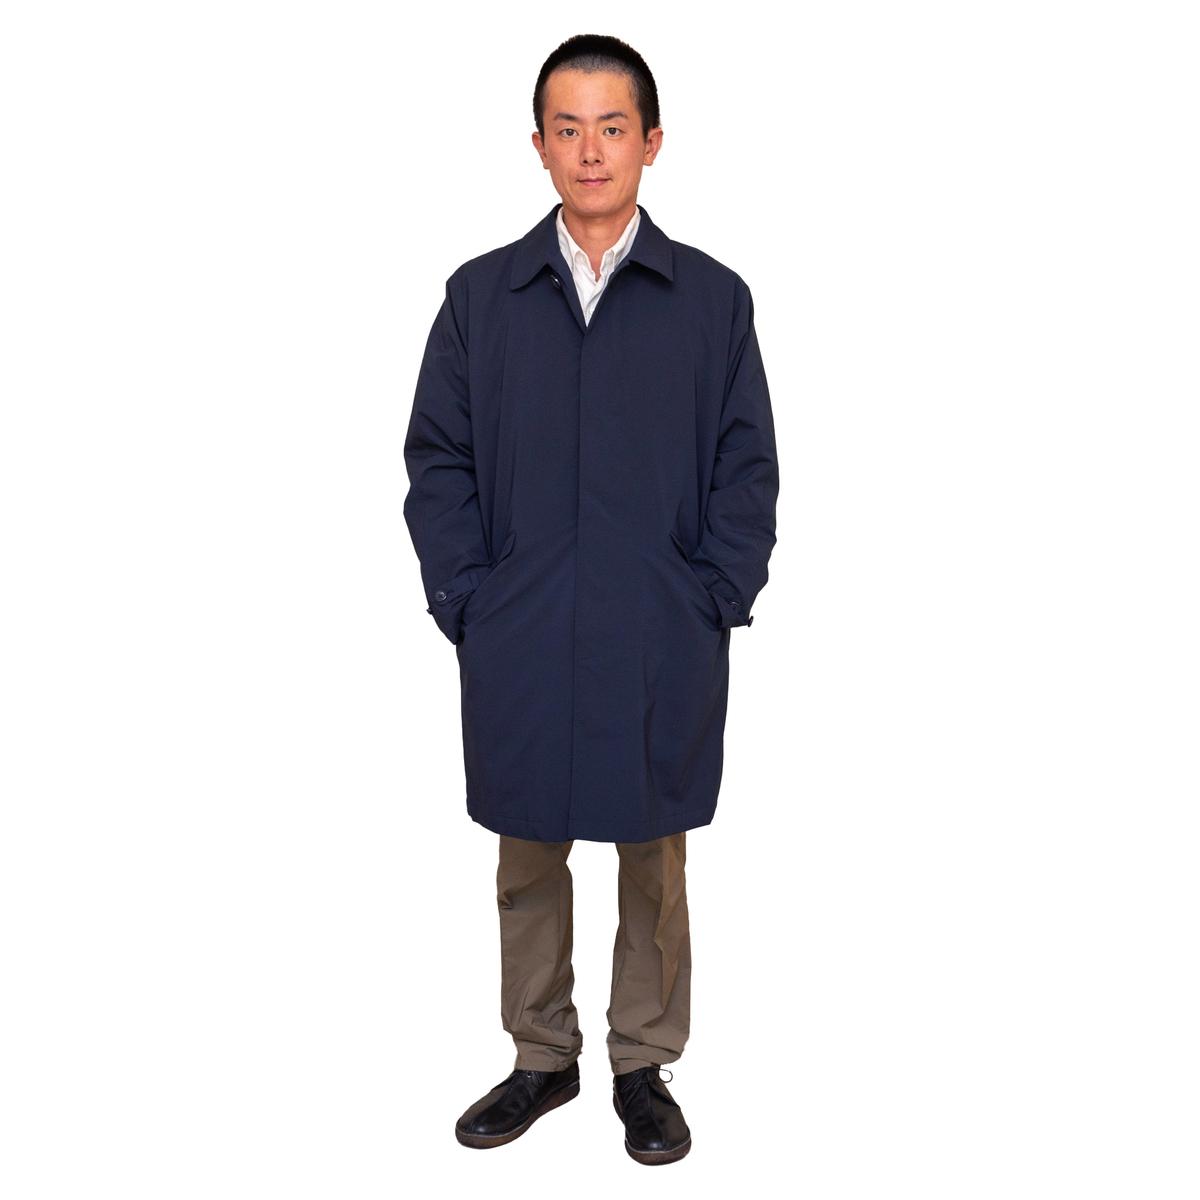 f:id:yamada0221:20210729124415j:plain